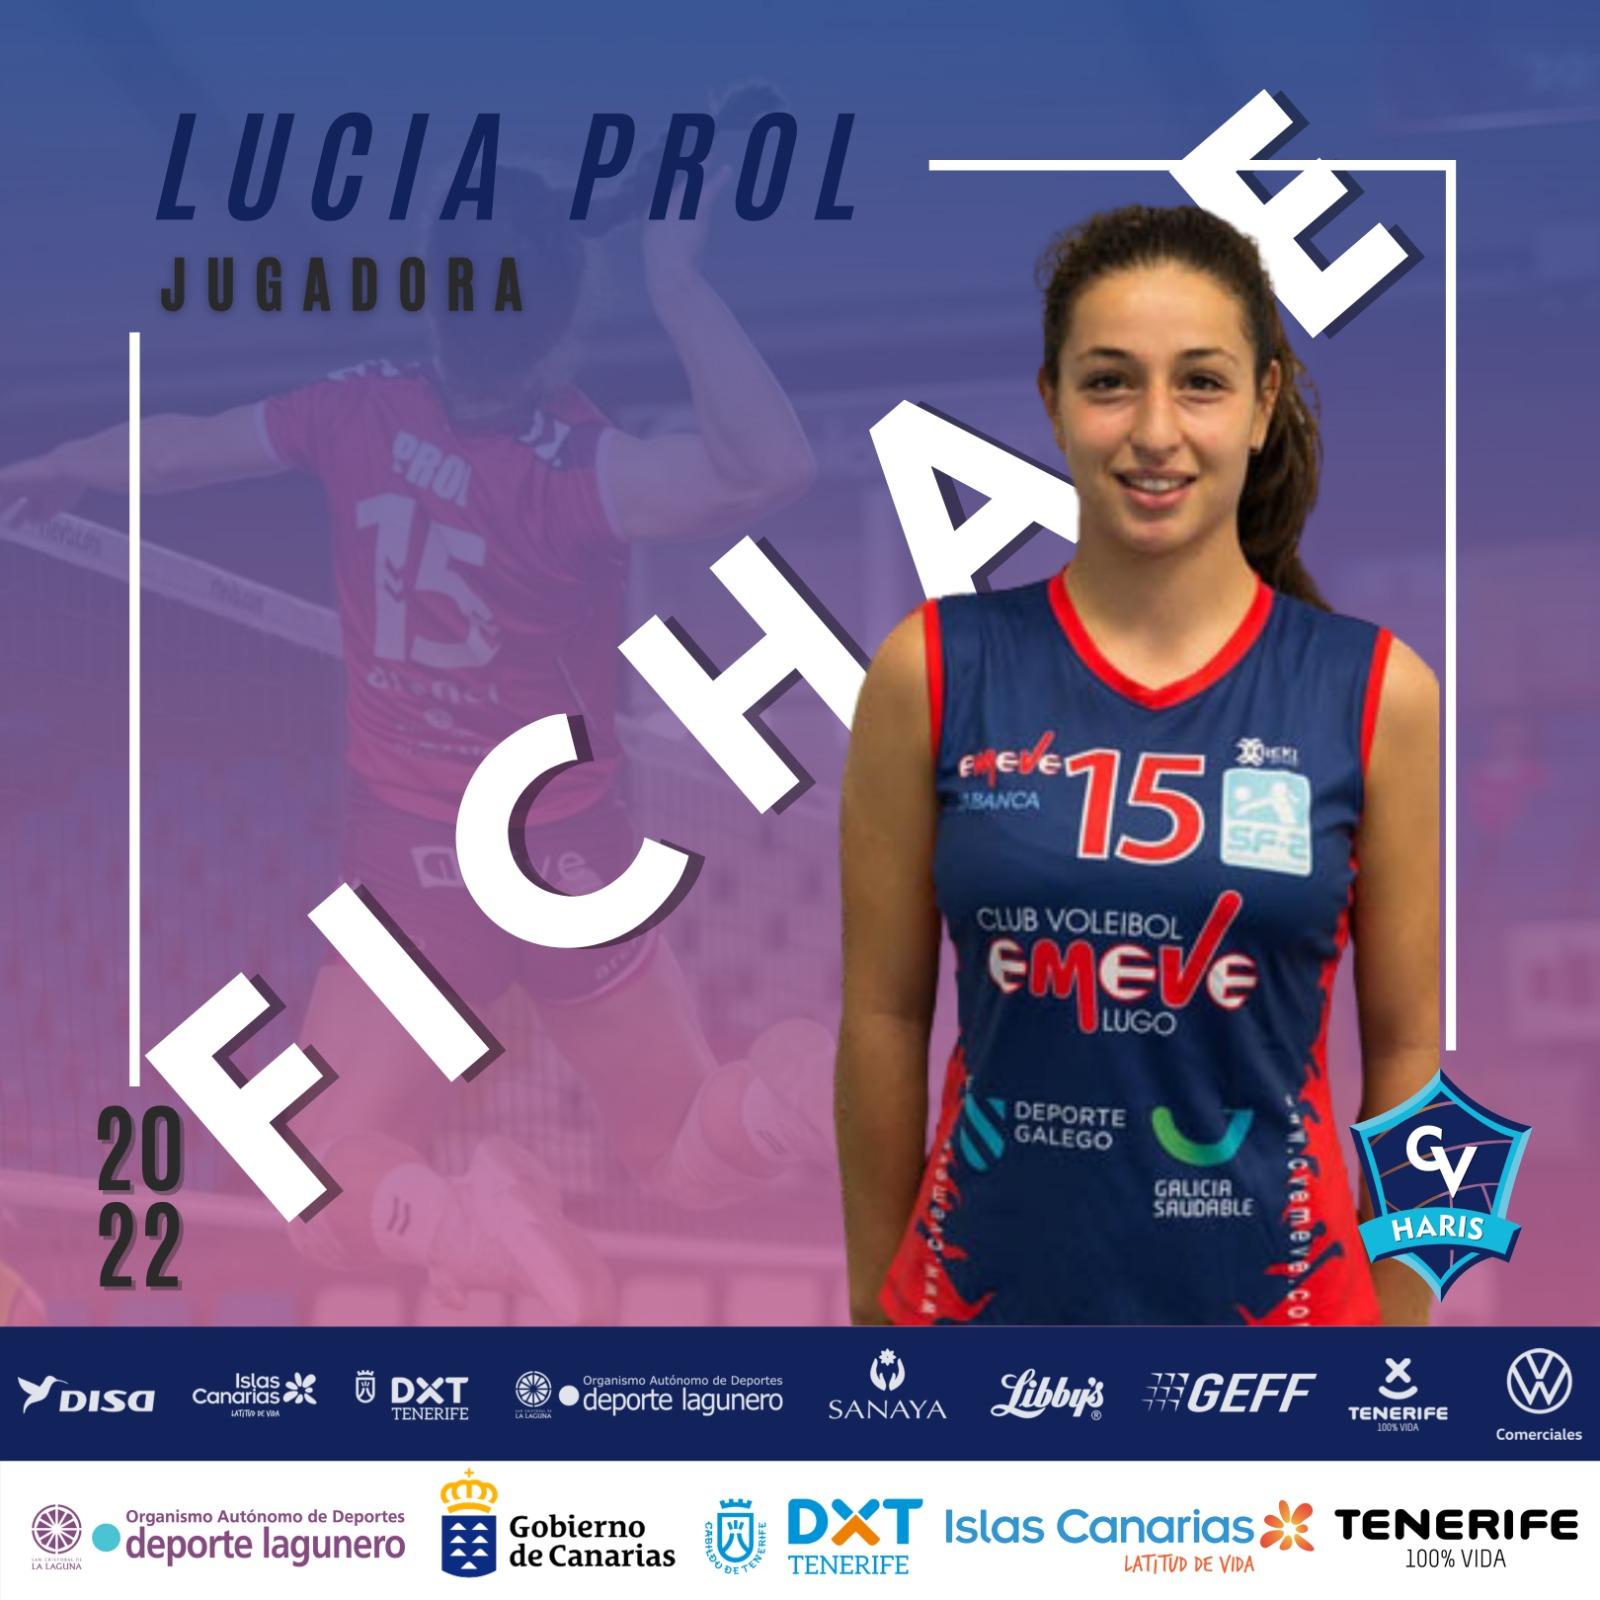 Lucía Prol ficha polo Sanaya Libbys La Laguna / CV HARIS